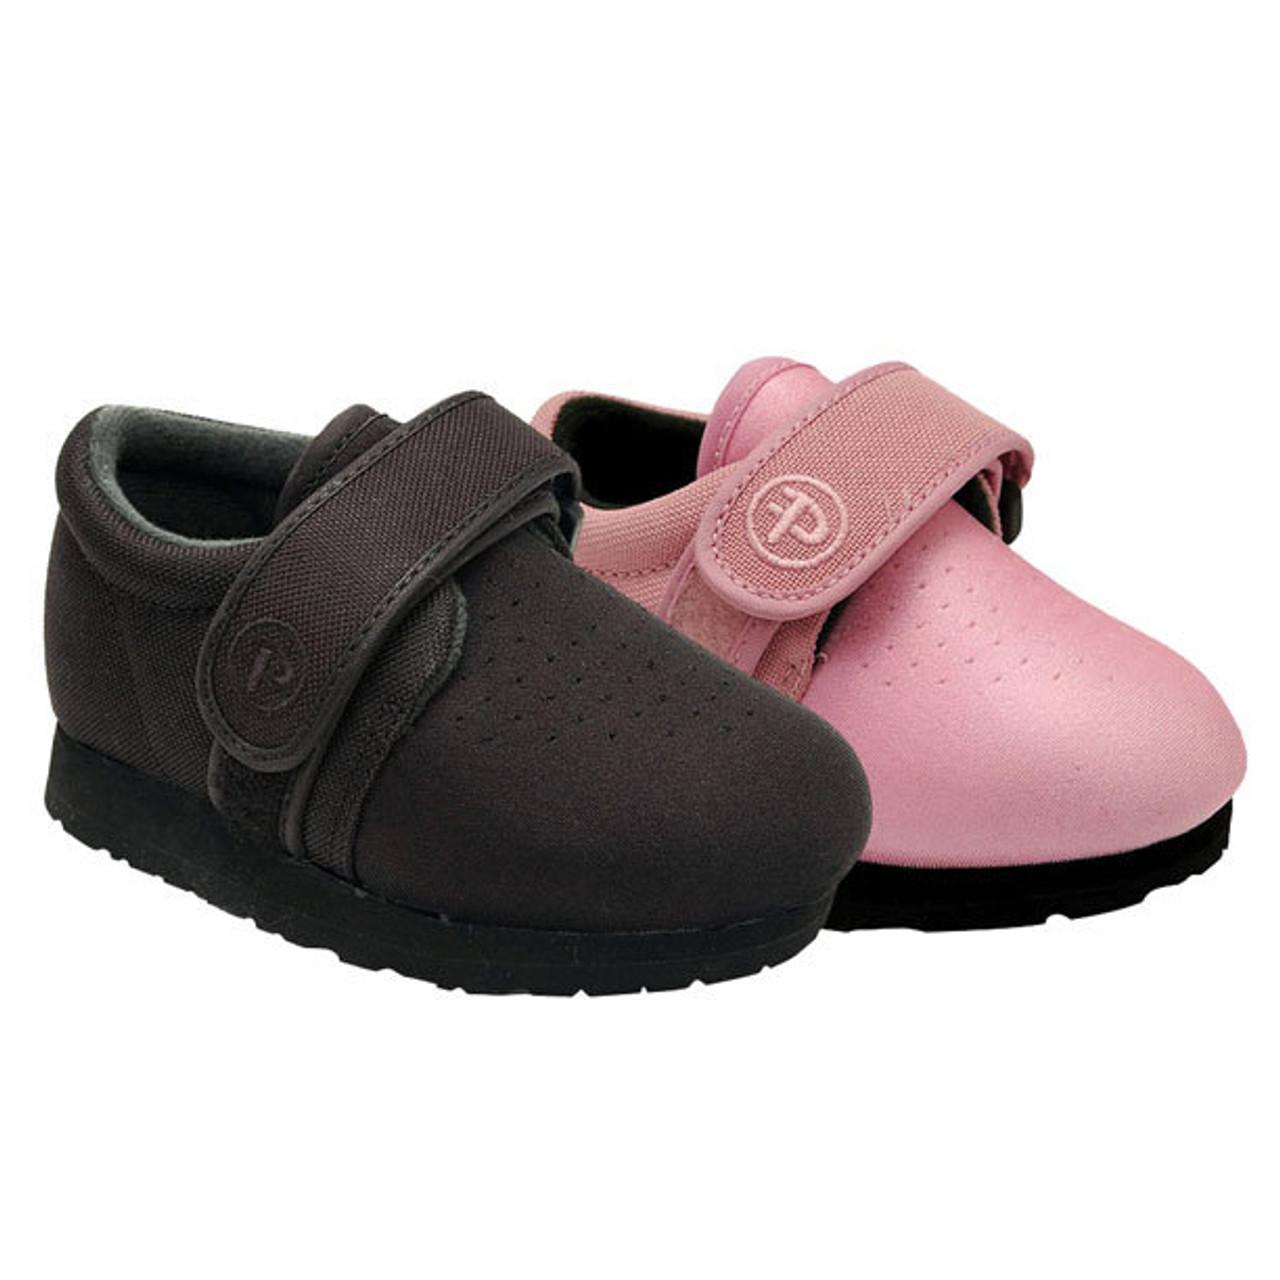 04c1cbffe9 Orthopedic Shoes For Epidermolysis Bullosa | EB by Pedors